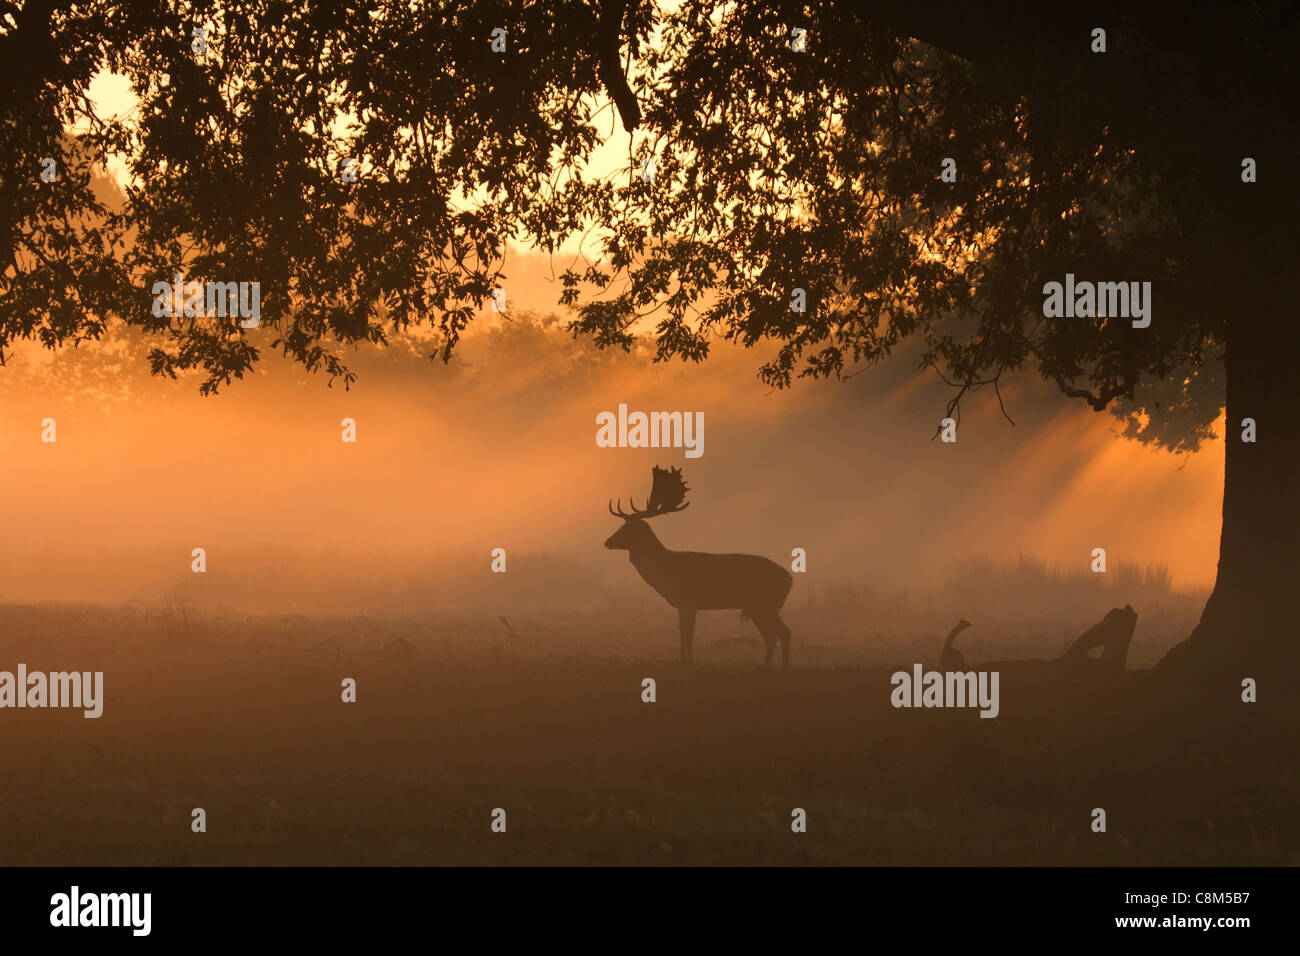 Fallow Deer, Dama dama buck silhouette in the early morning light - Stock Image